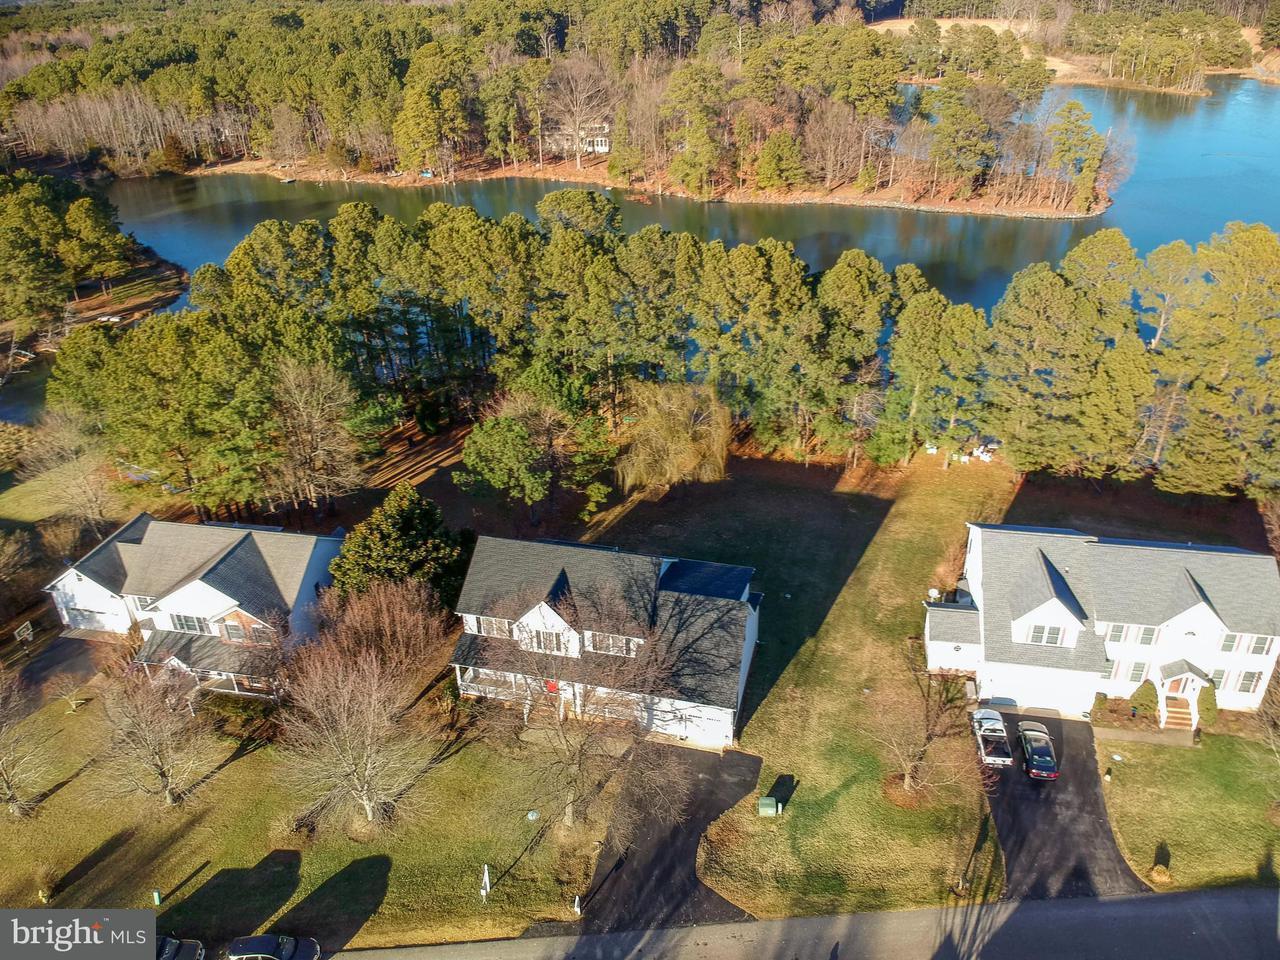 Moradia para Venda às 44610 Bellview Court 44610 Bellview Court Tall Timbers, Maryland 20690 Estados Unidos